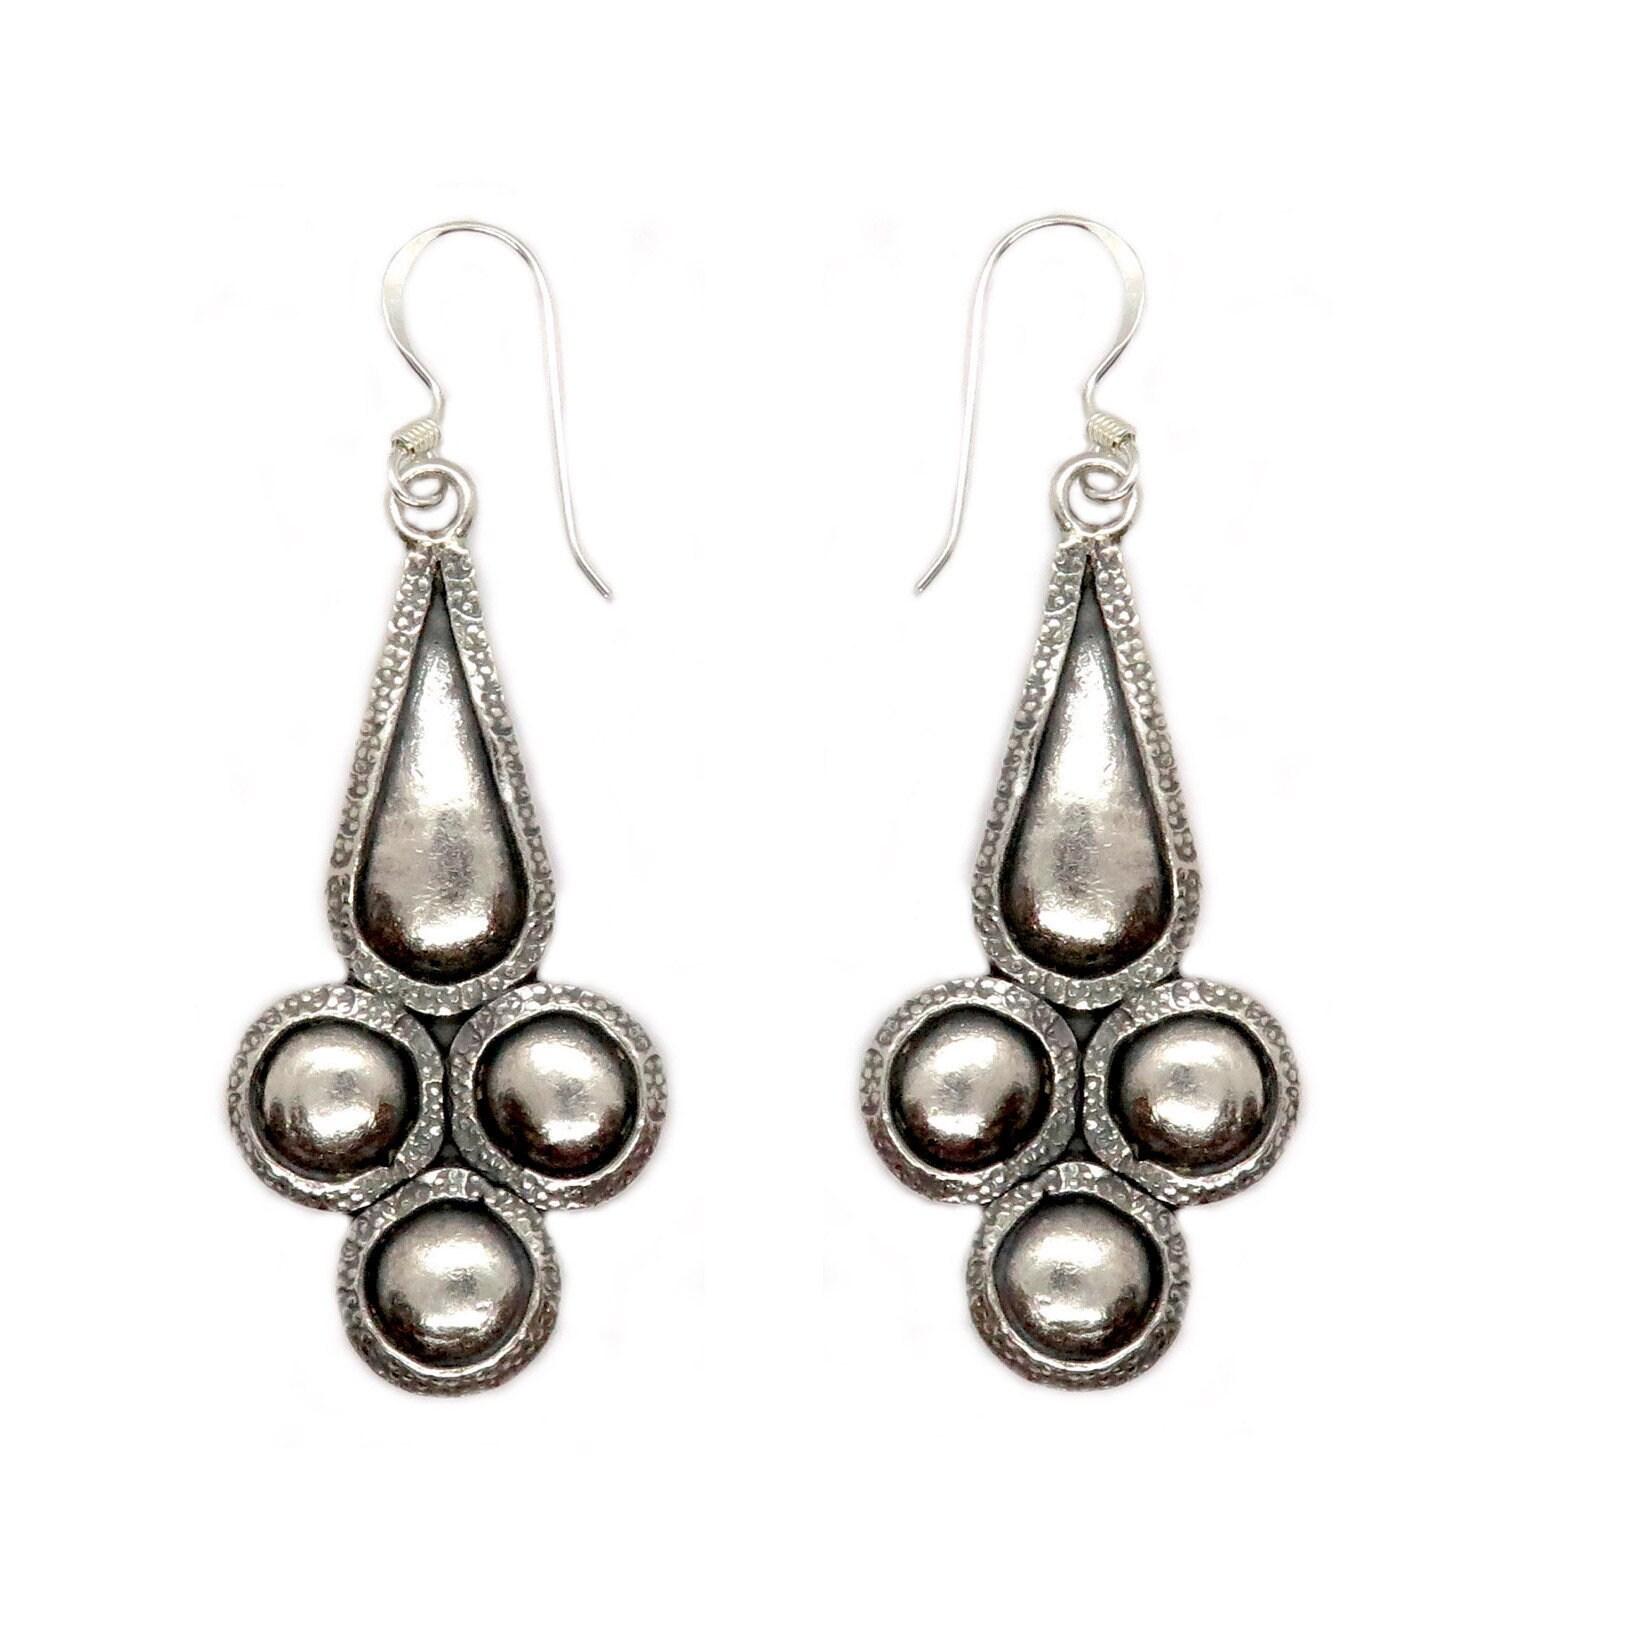 Silver Jewelry Handmade Birthday Gift for Women Jewelry Ethnic Boho Dangle Earrings Sterling Silver Jewelry Pewter Earrings Bohemian